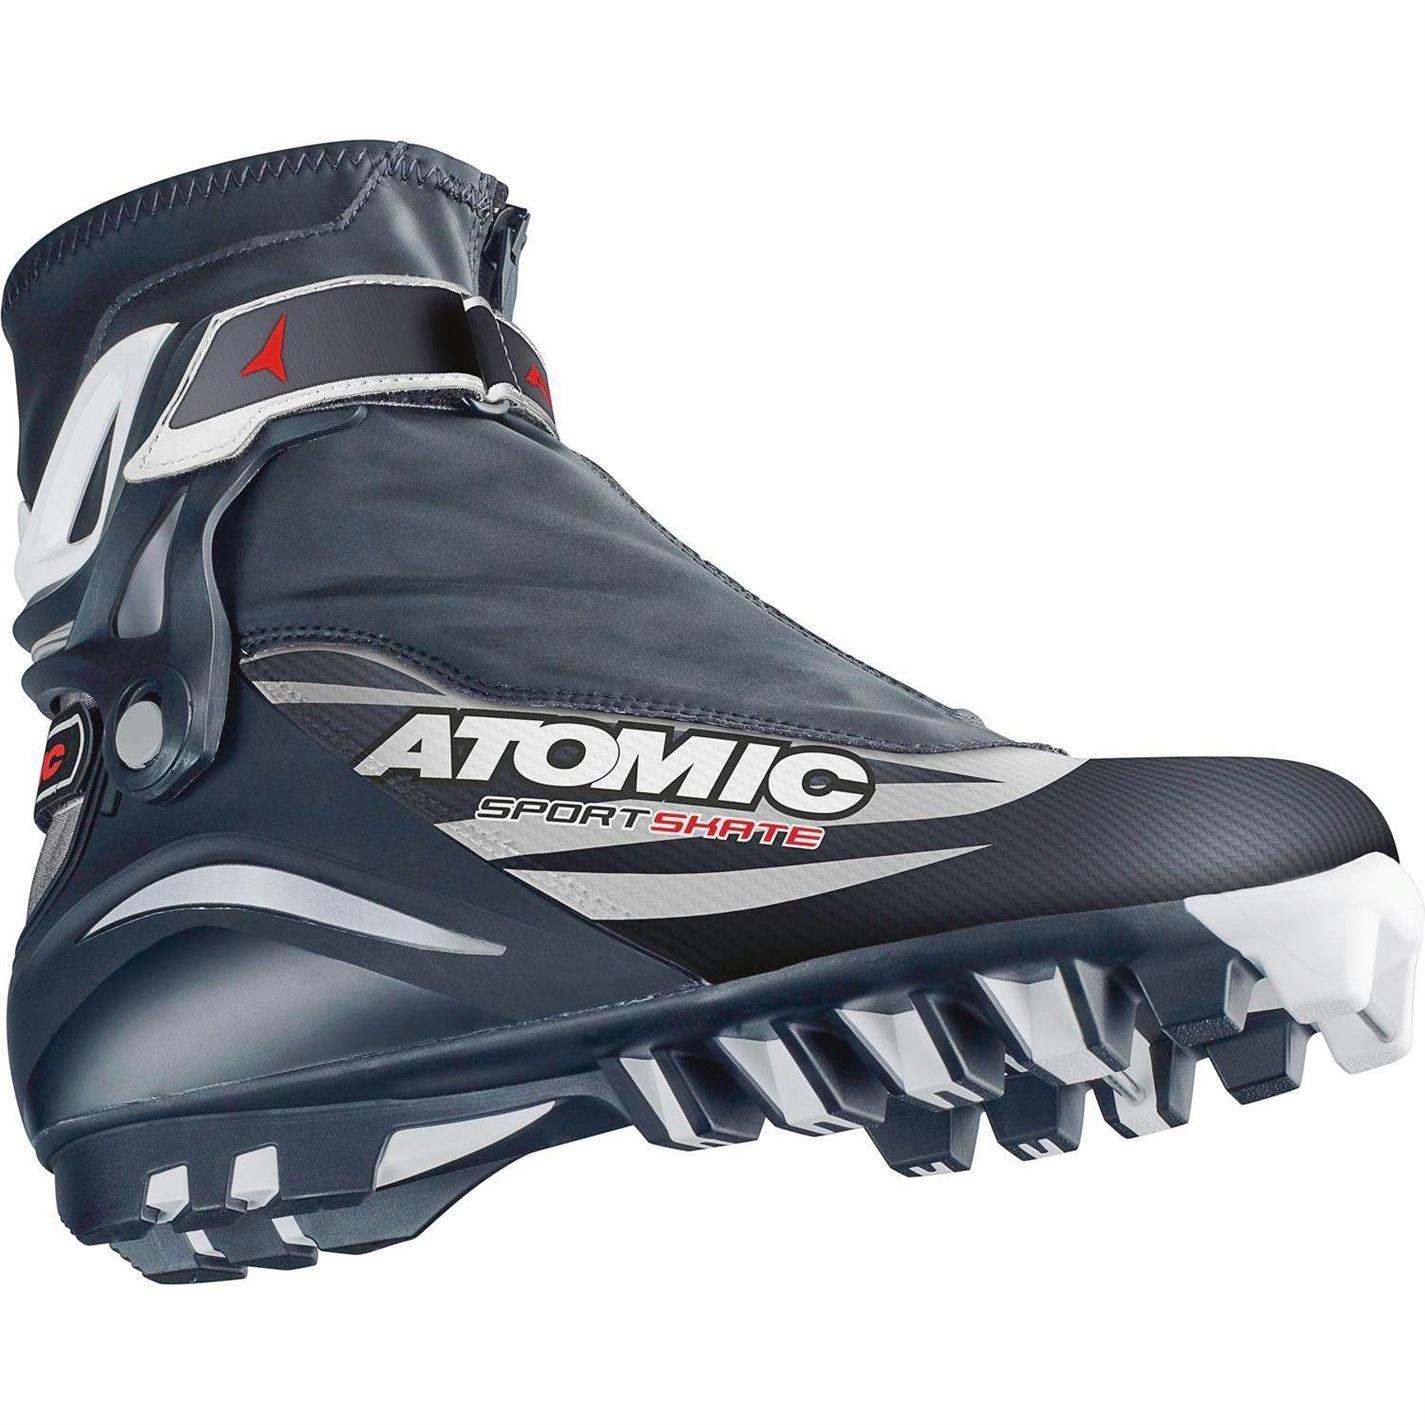 Atomic Mens Cc Sport Skate Ski Boots Cross Country Snow